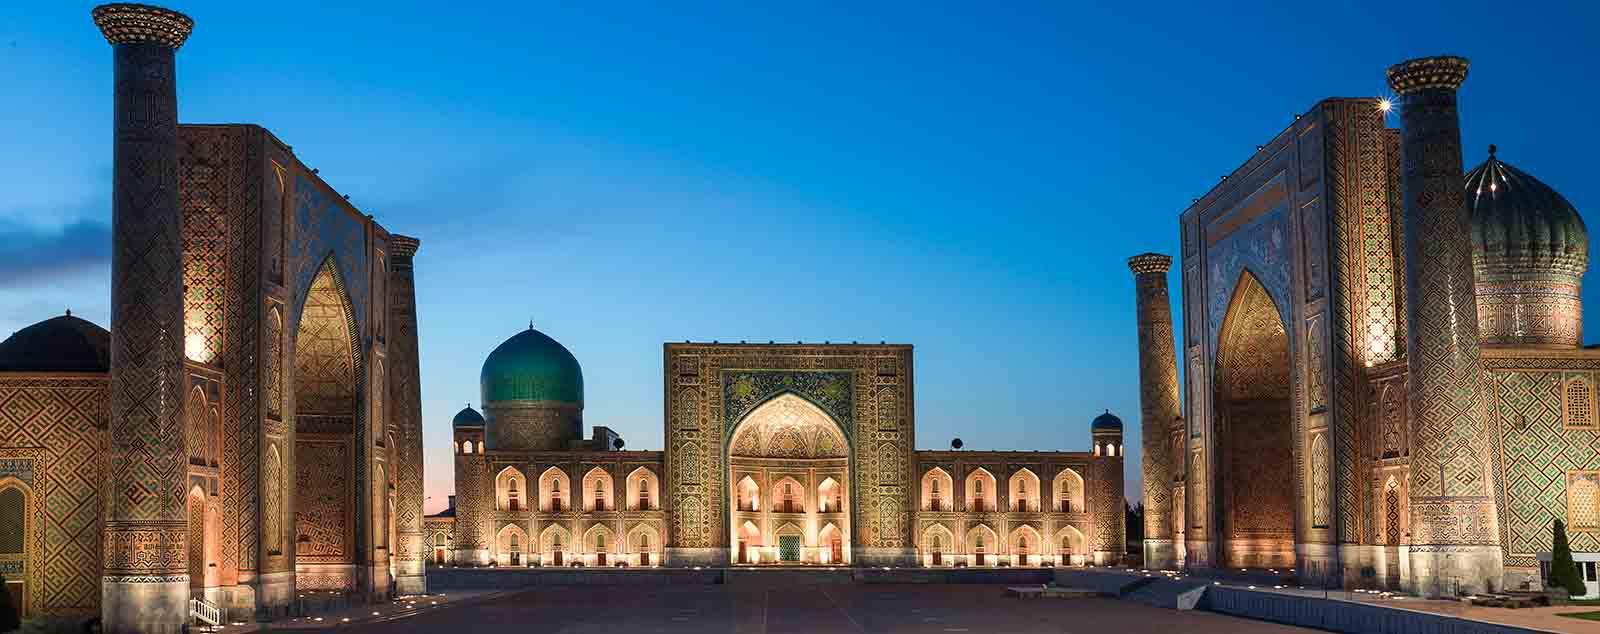 The three huge madrasahs of Registan Square illuminated at night